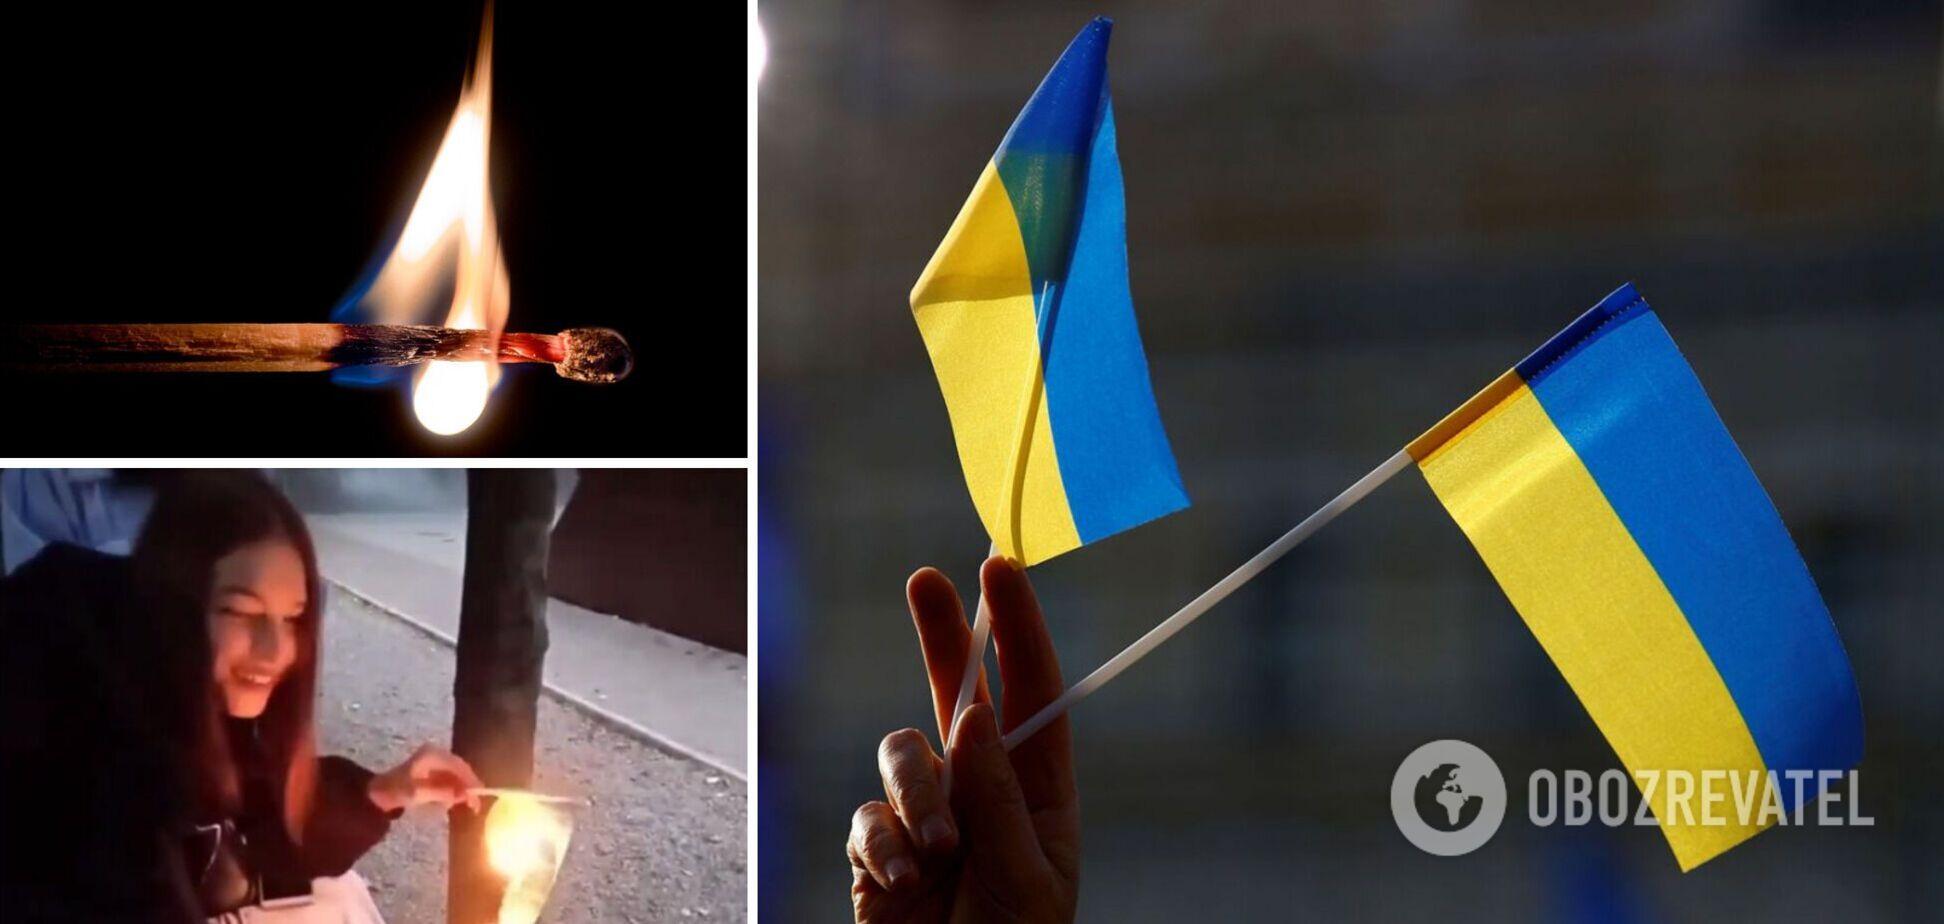 Скандал з українським прапором